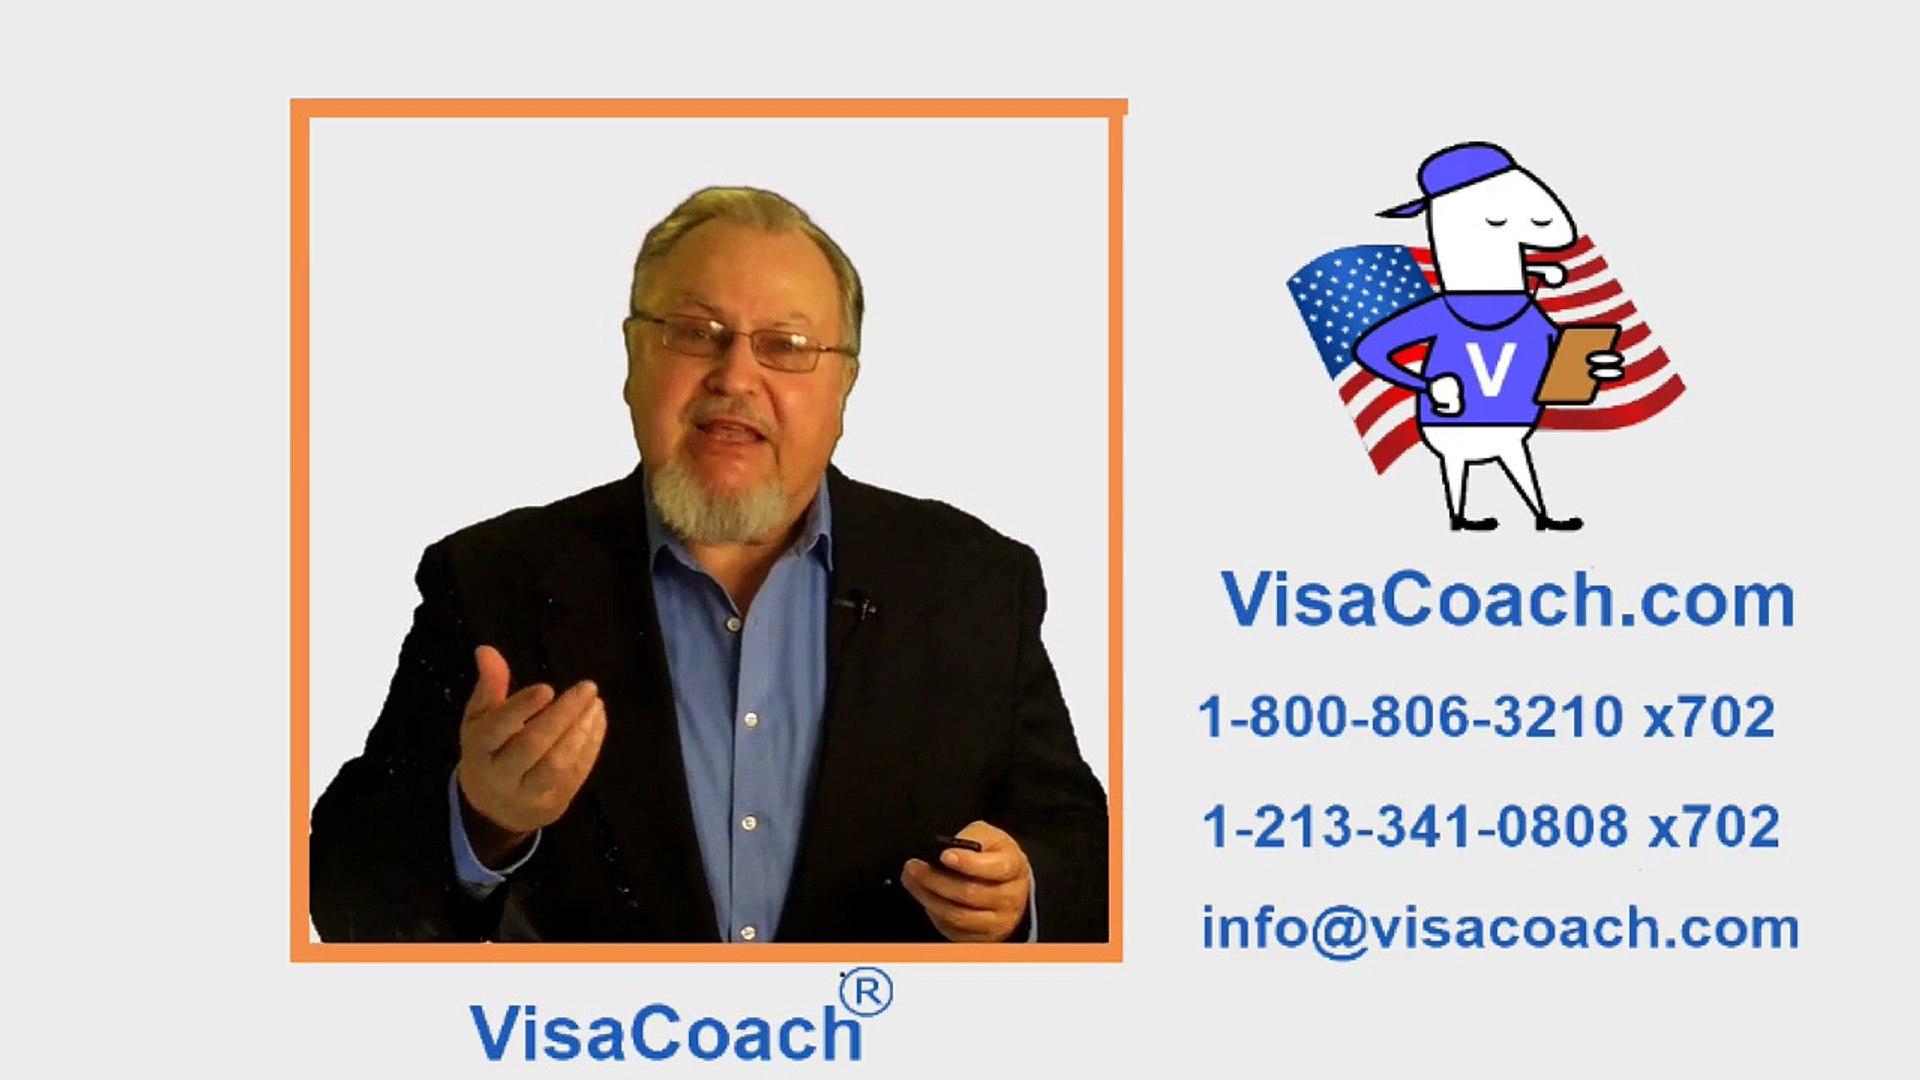 VisaCoach: Free Consultation on K1 Fiance or CR1 Spouse Visas